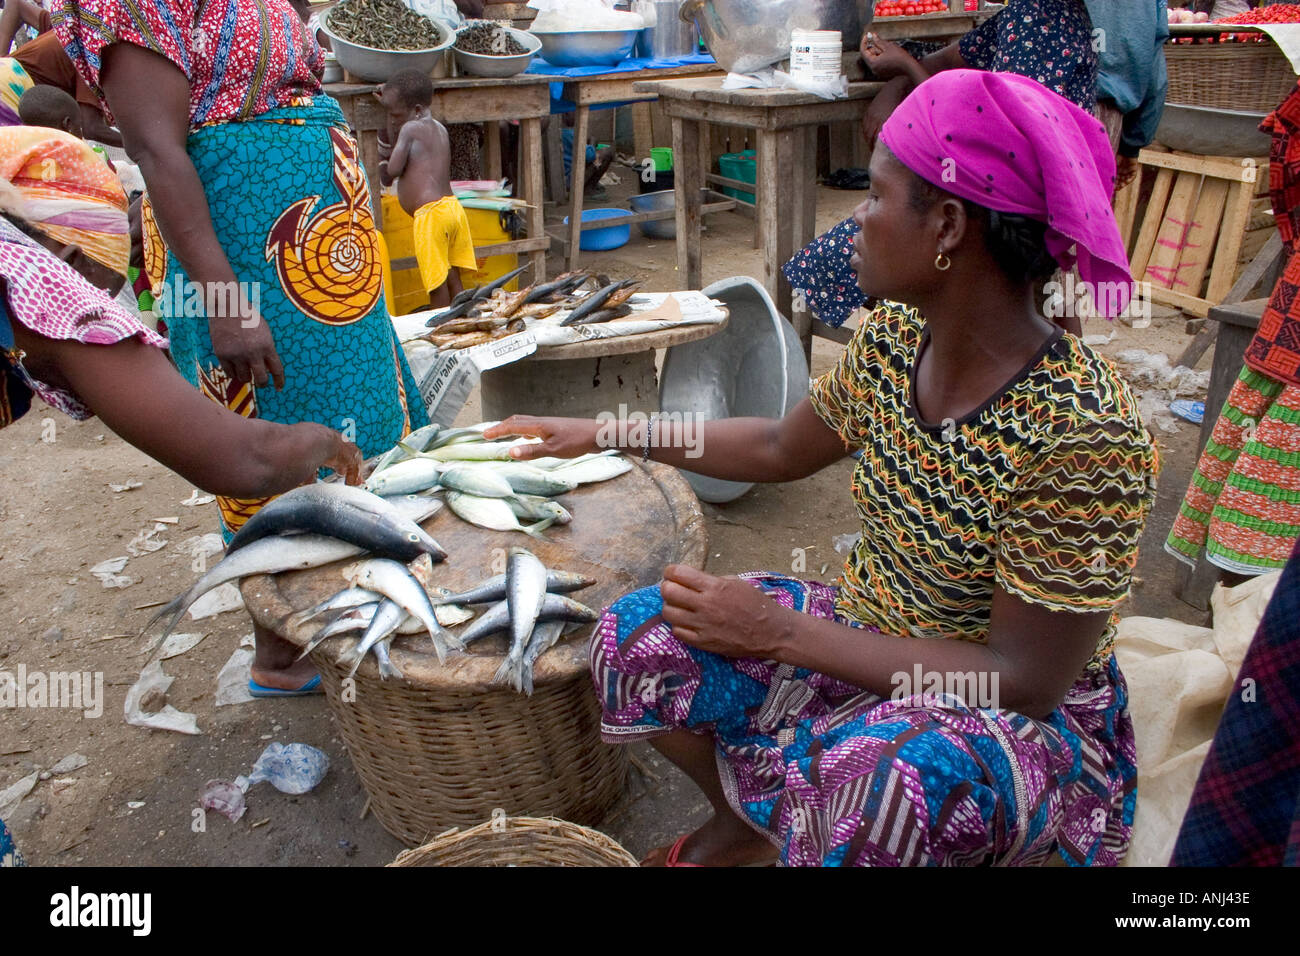 Market woman in a small fishing market in the fishing quarter of Winneba Ghana - Stock Image